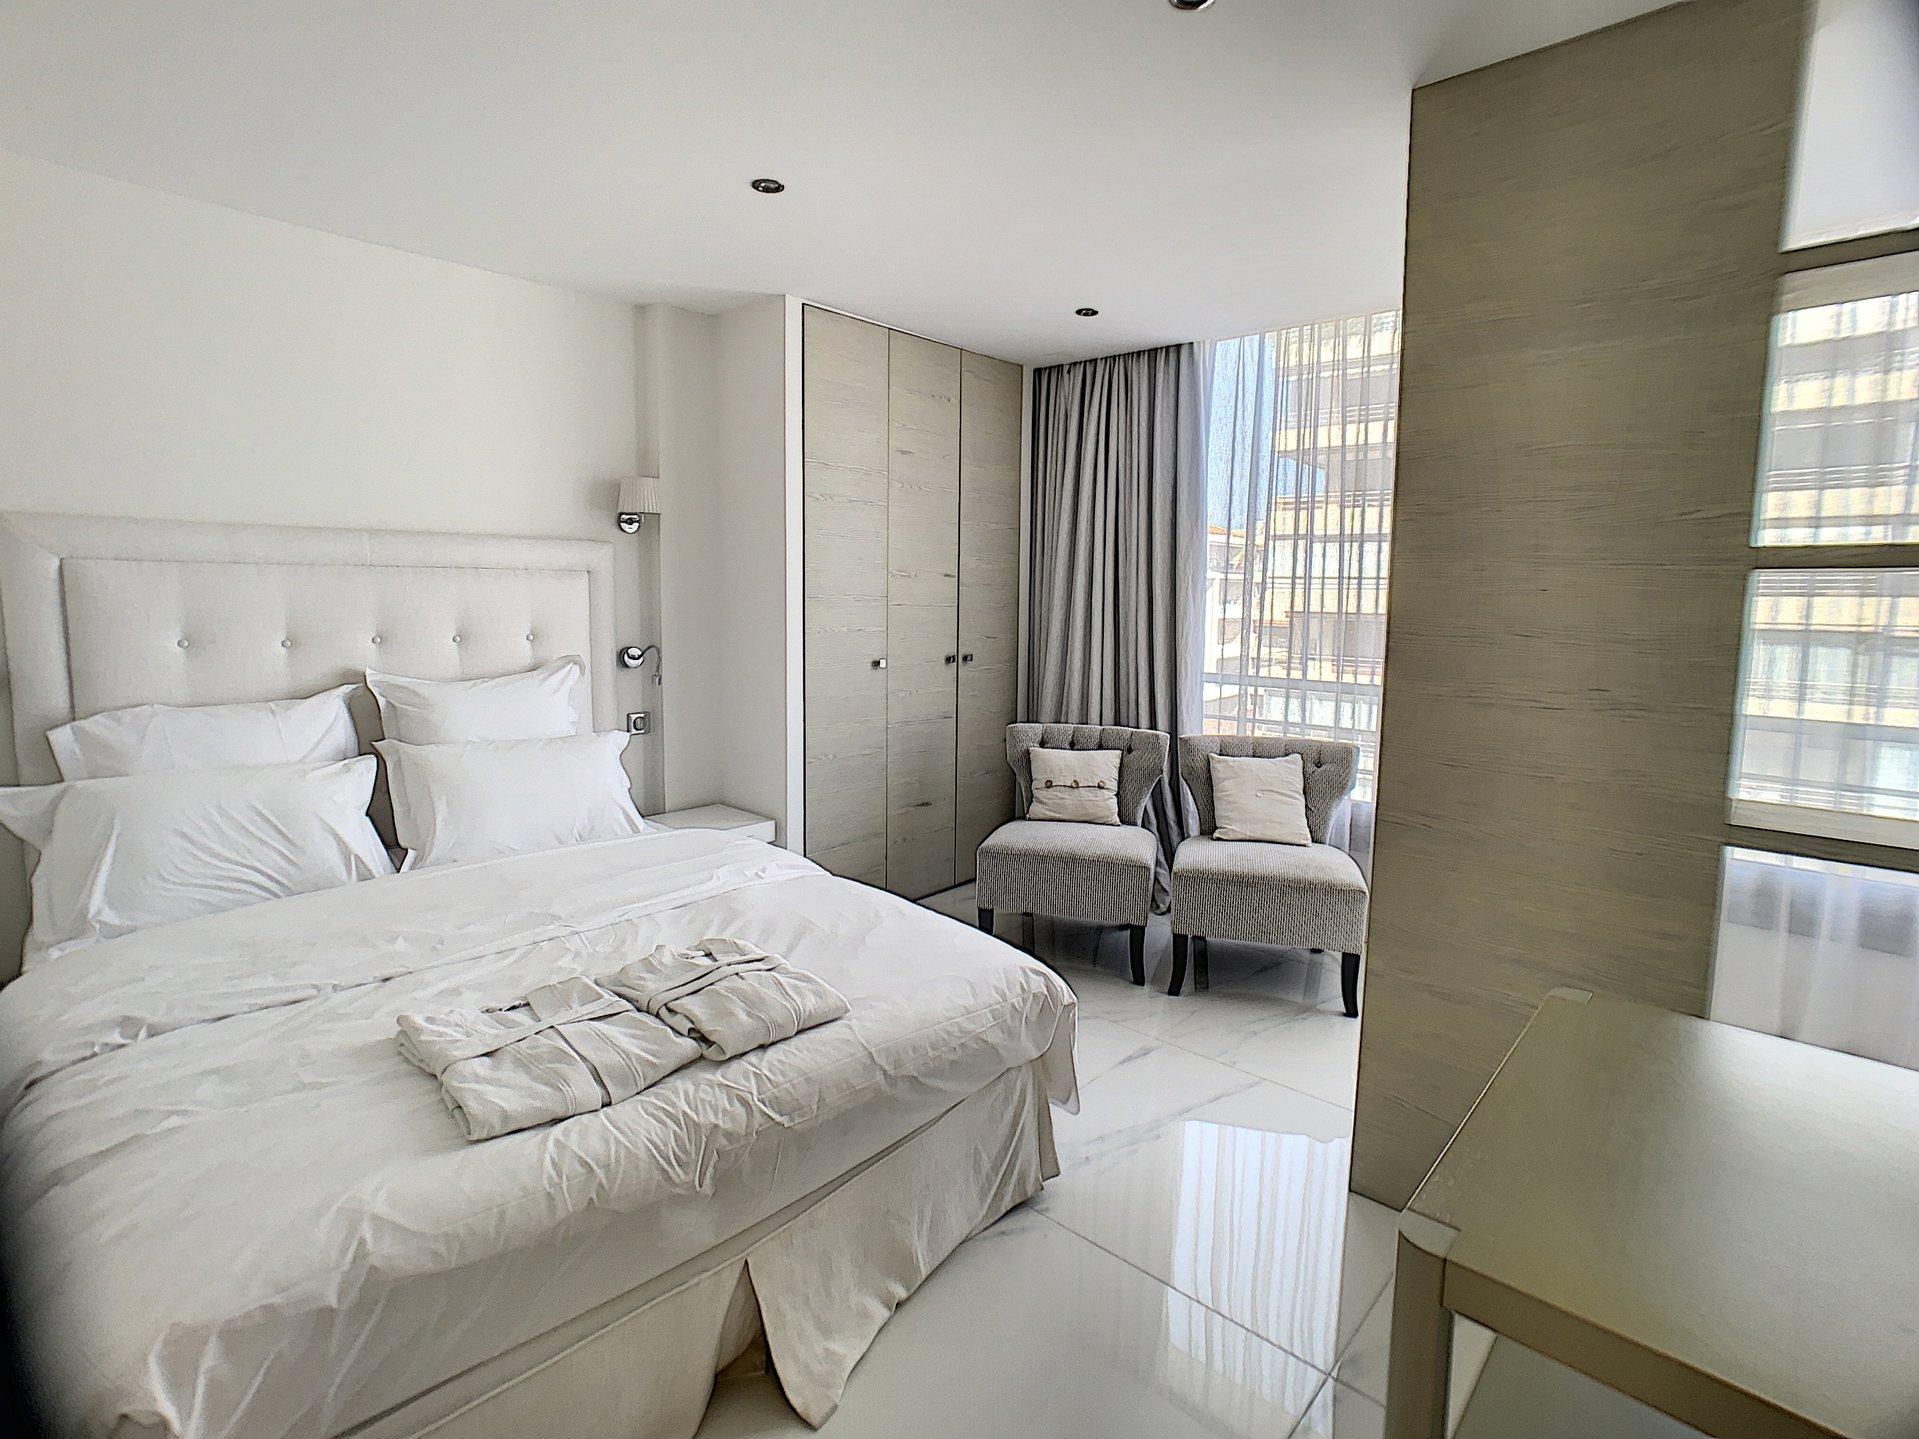 Location Appartement - Cannes Croisette